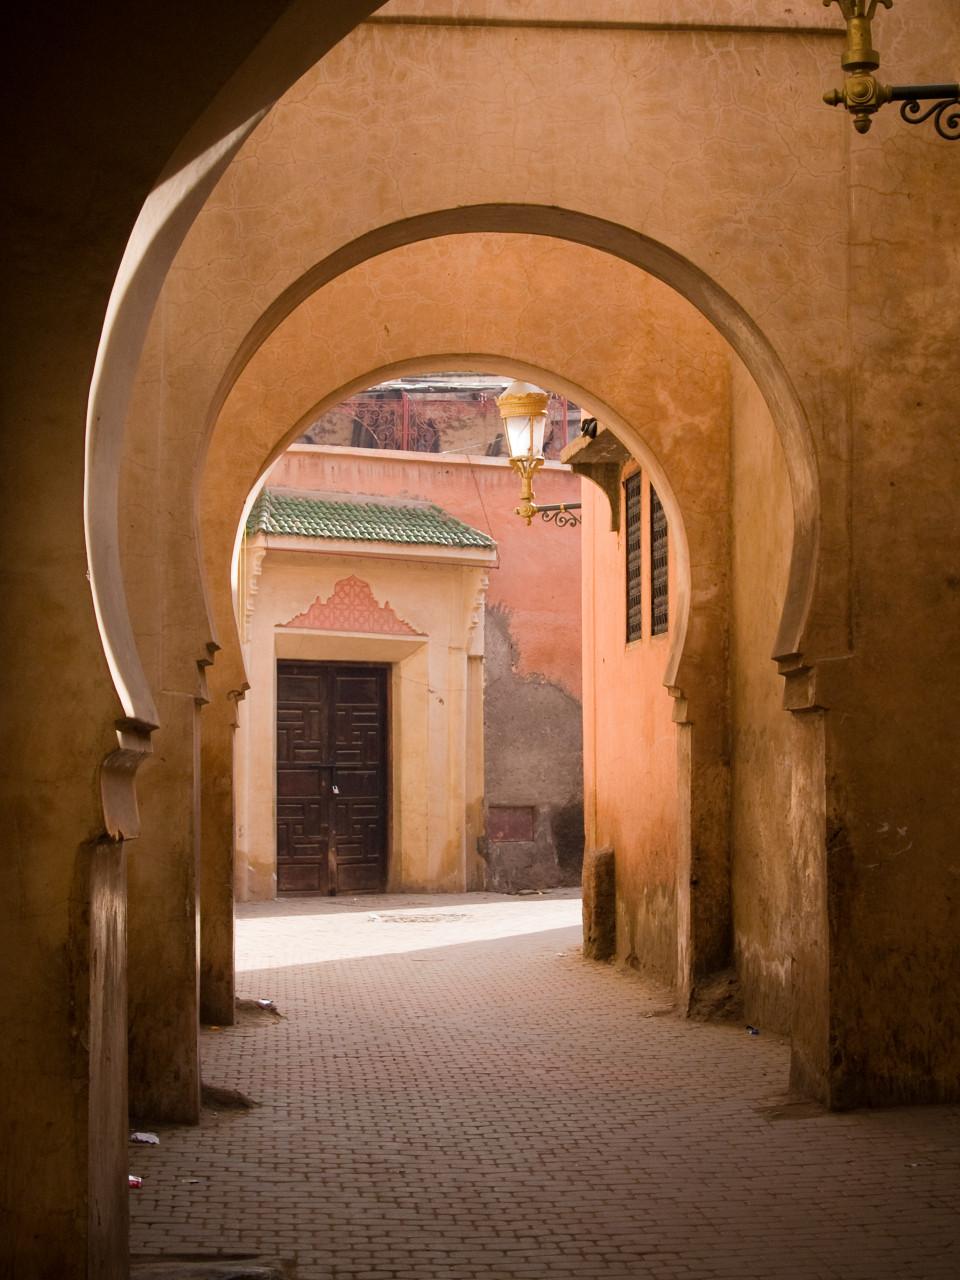 Dans les ruelles de la médina de Marrakech. (© RafalBelzowski))